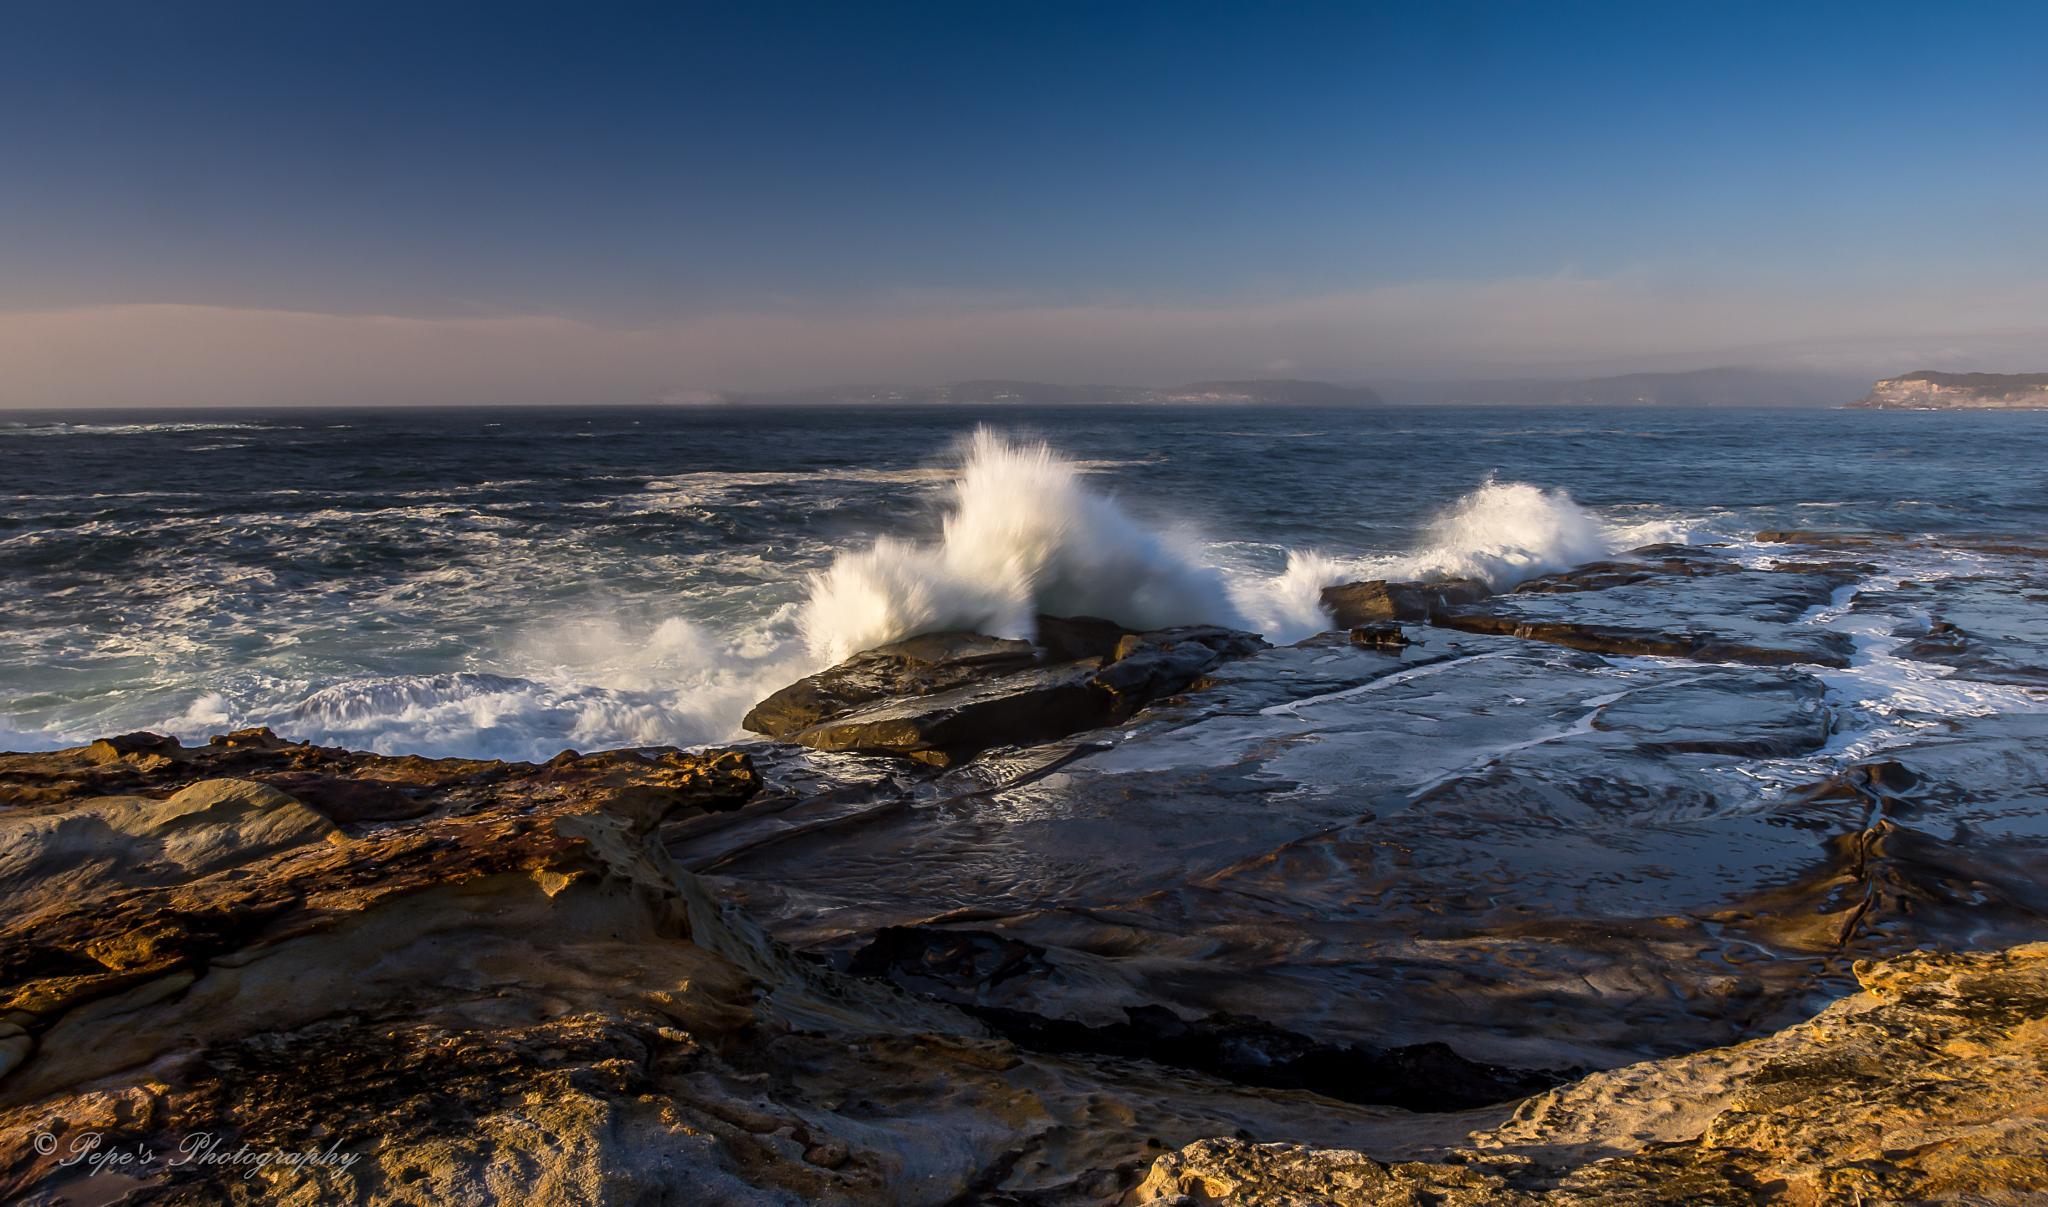 Seascape by PepeRojas